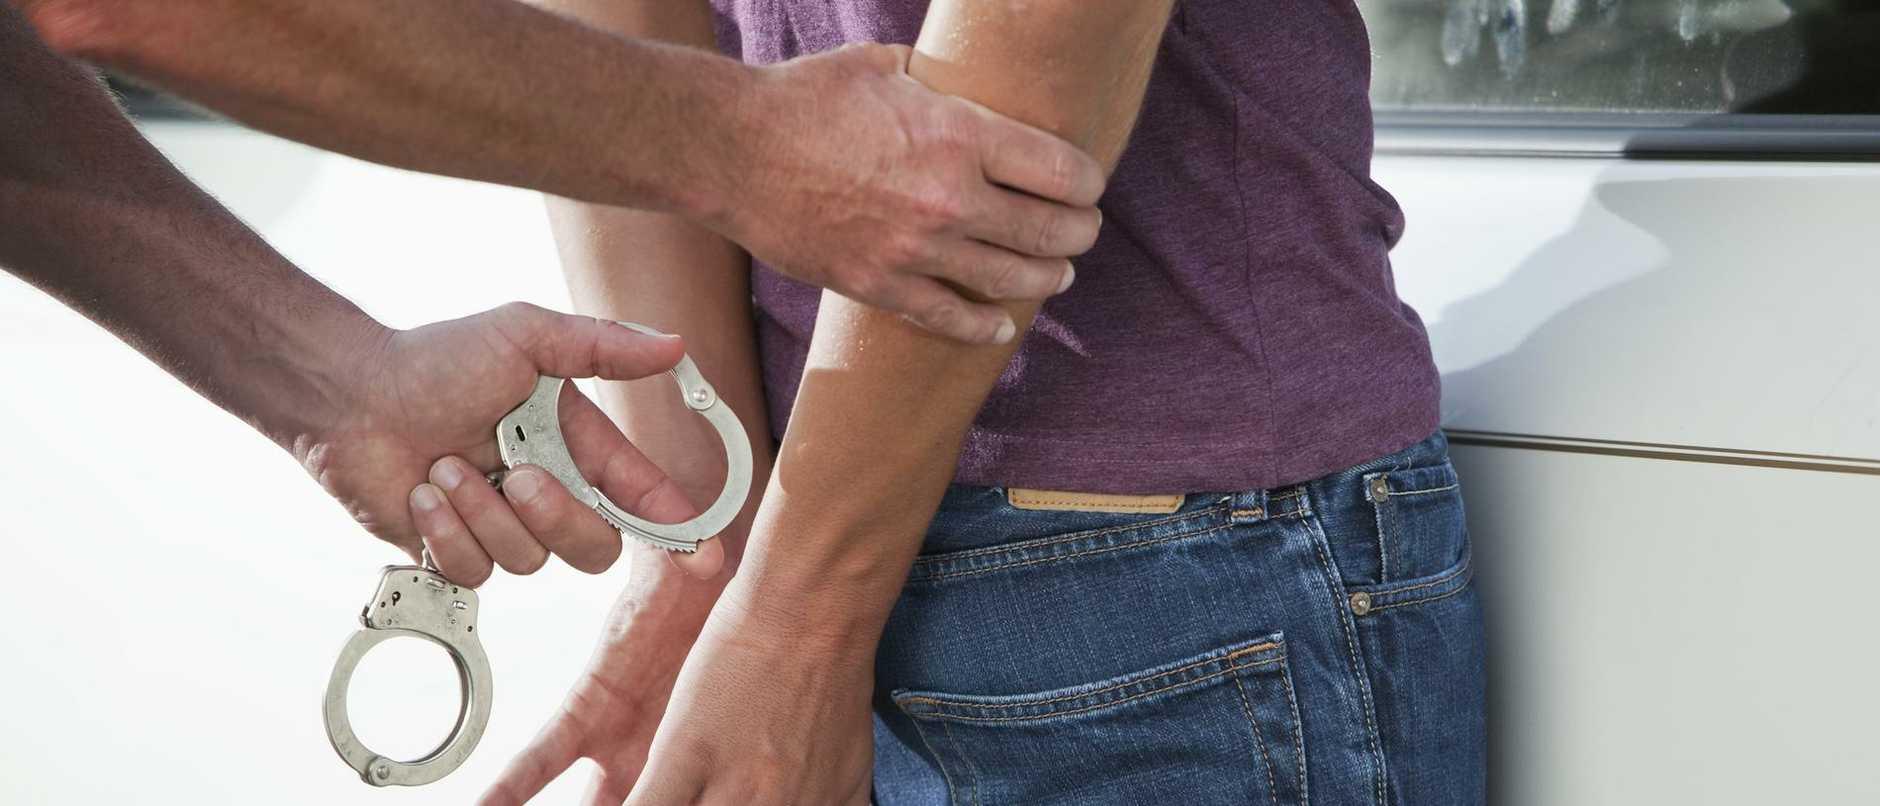 Teenager being handcuffed